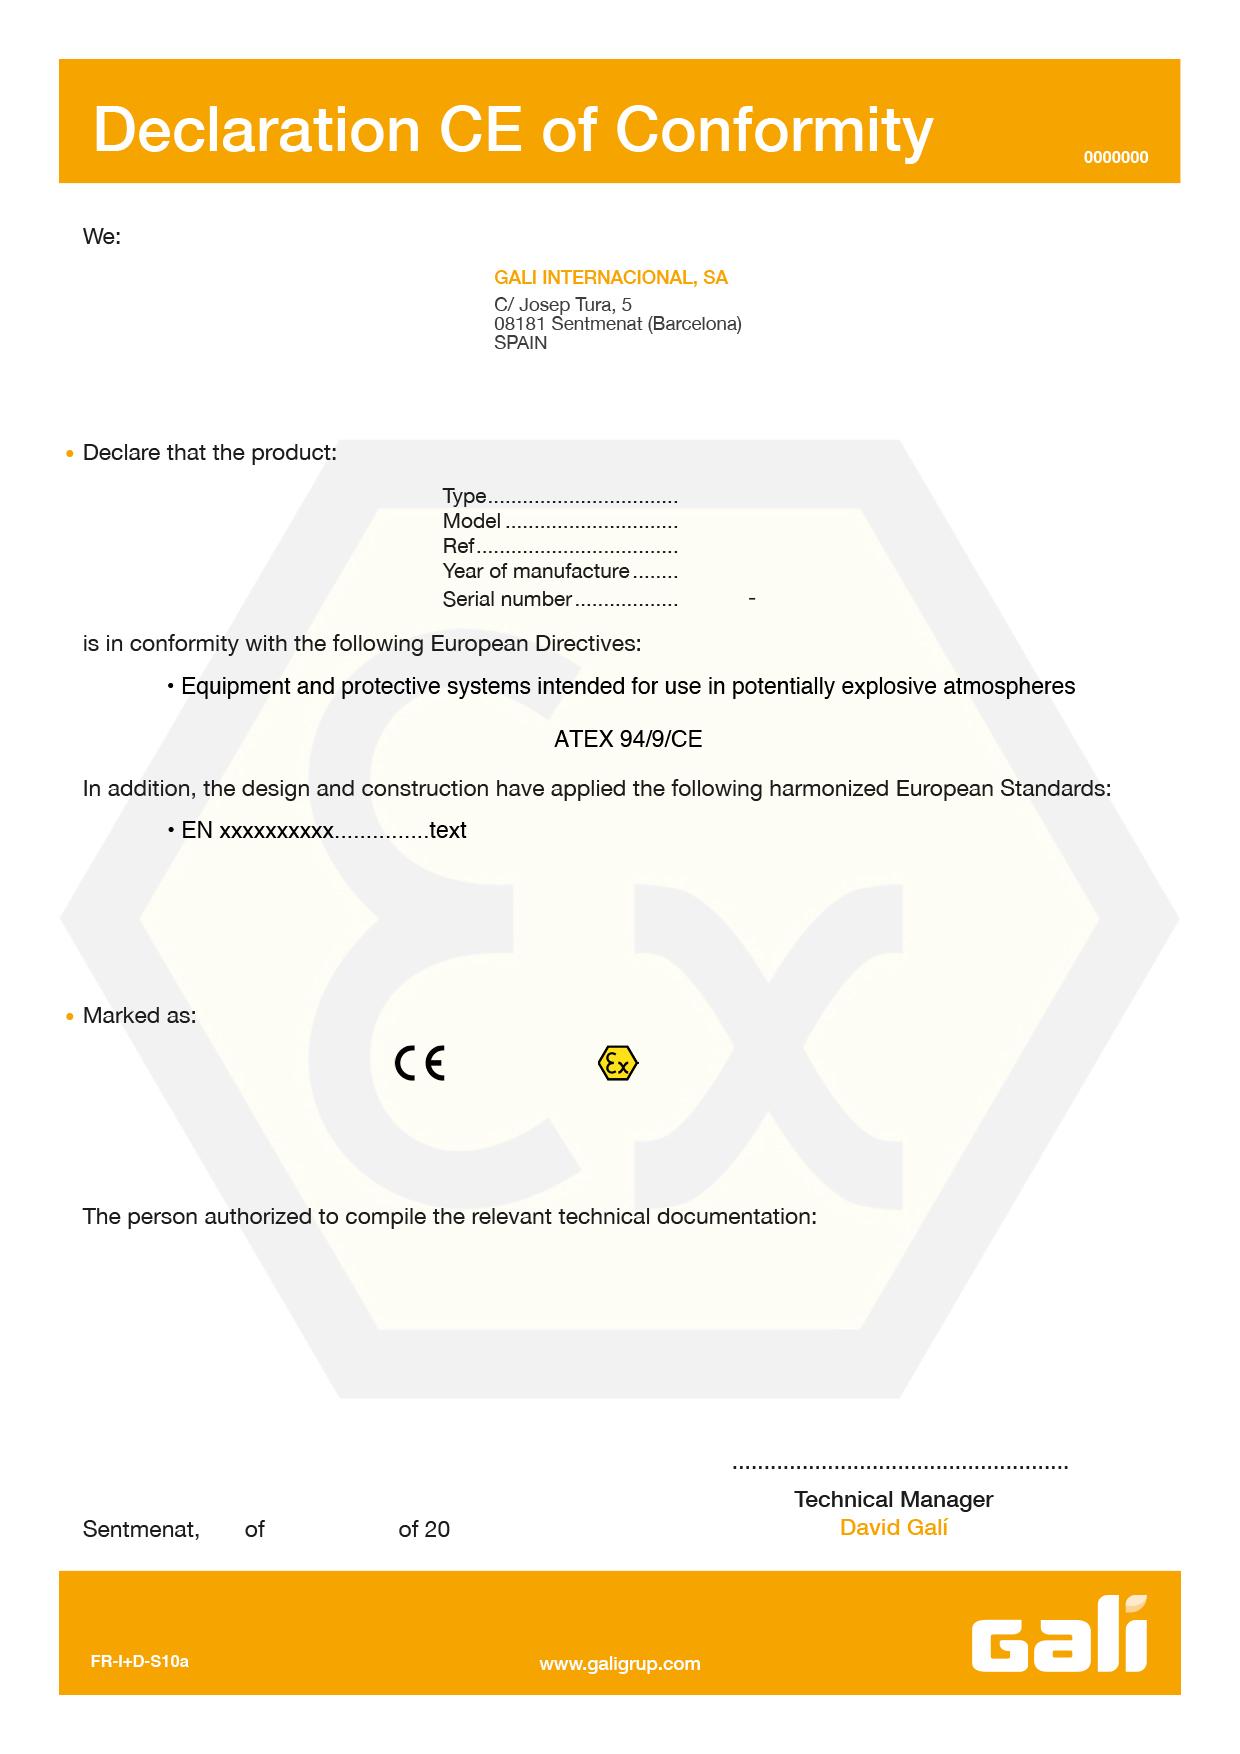 Hydraulic starters ATEX-IECEX declaration CE of conformity